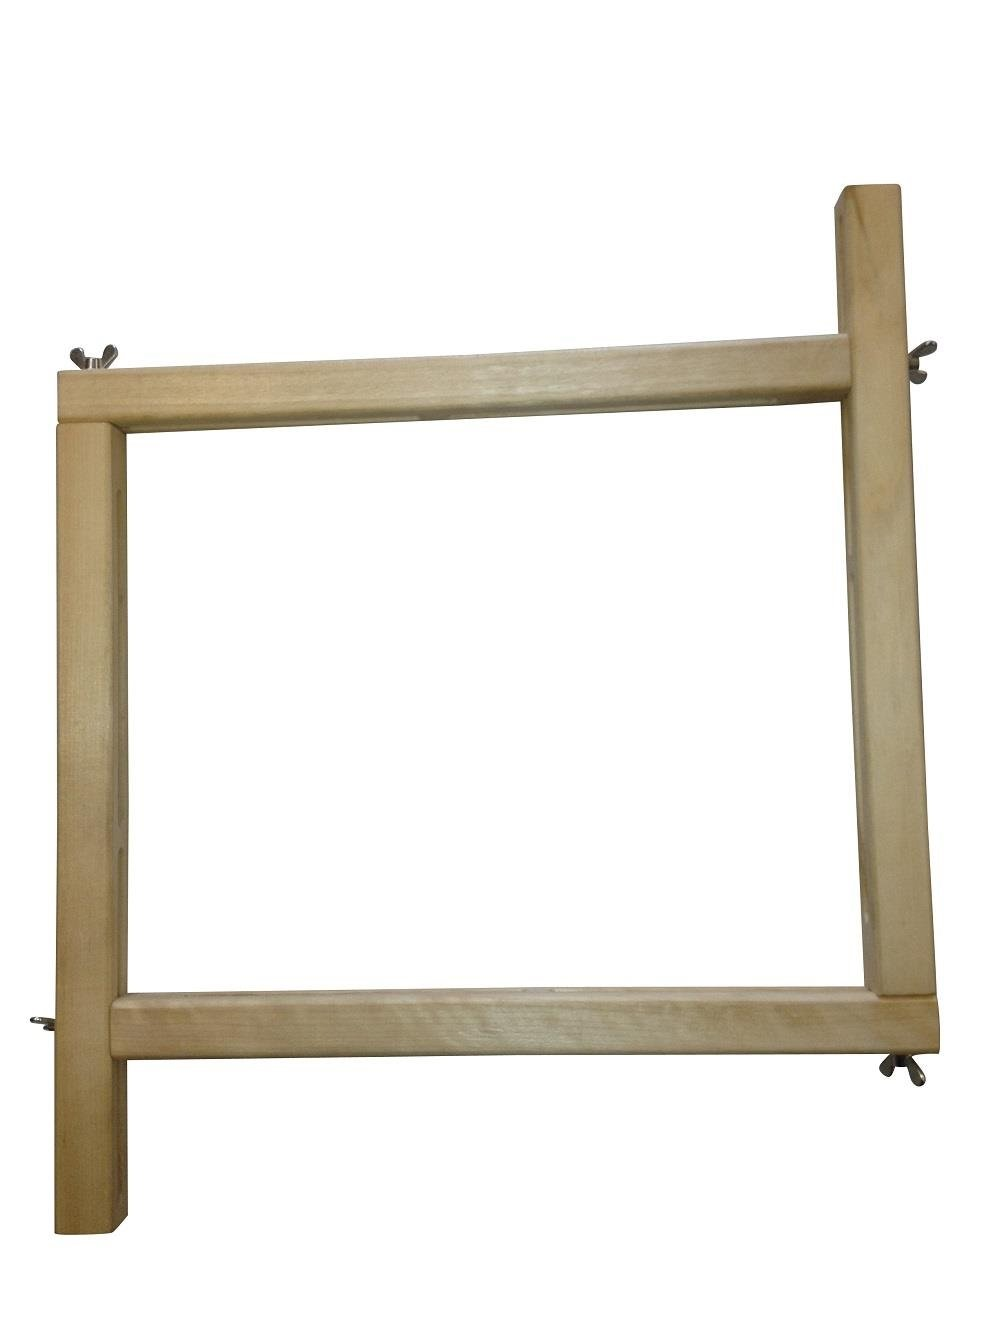 Frank A. Edmunds 16-inch Adjustable Stretcher Bar Set,4016 Frank A. Edmunds & Co Inc FAE4016